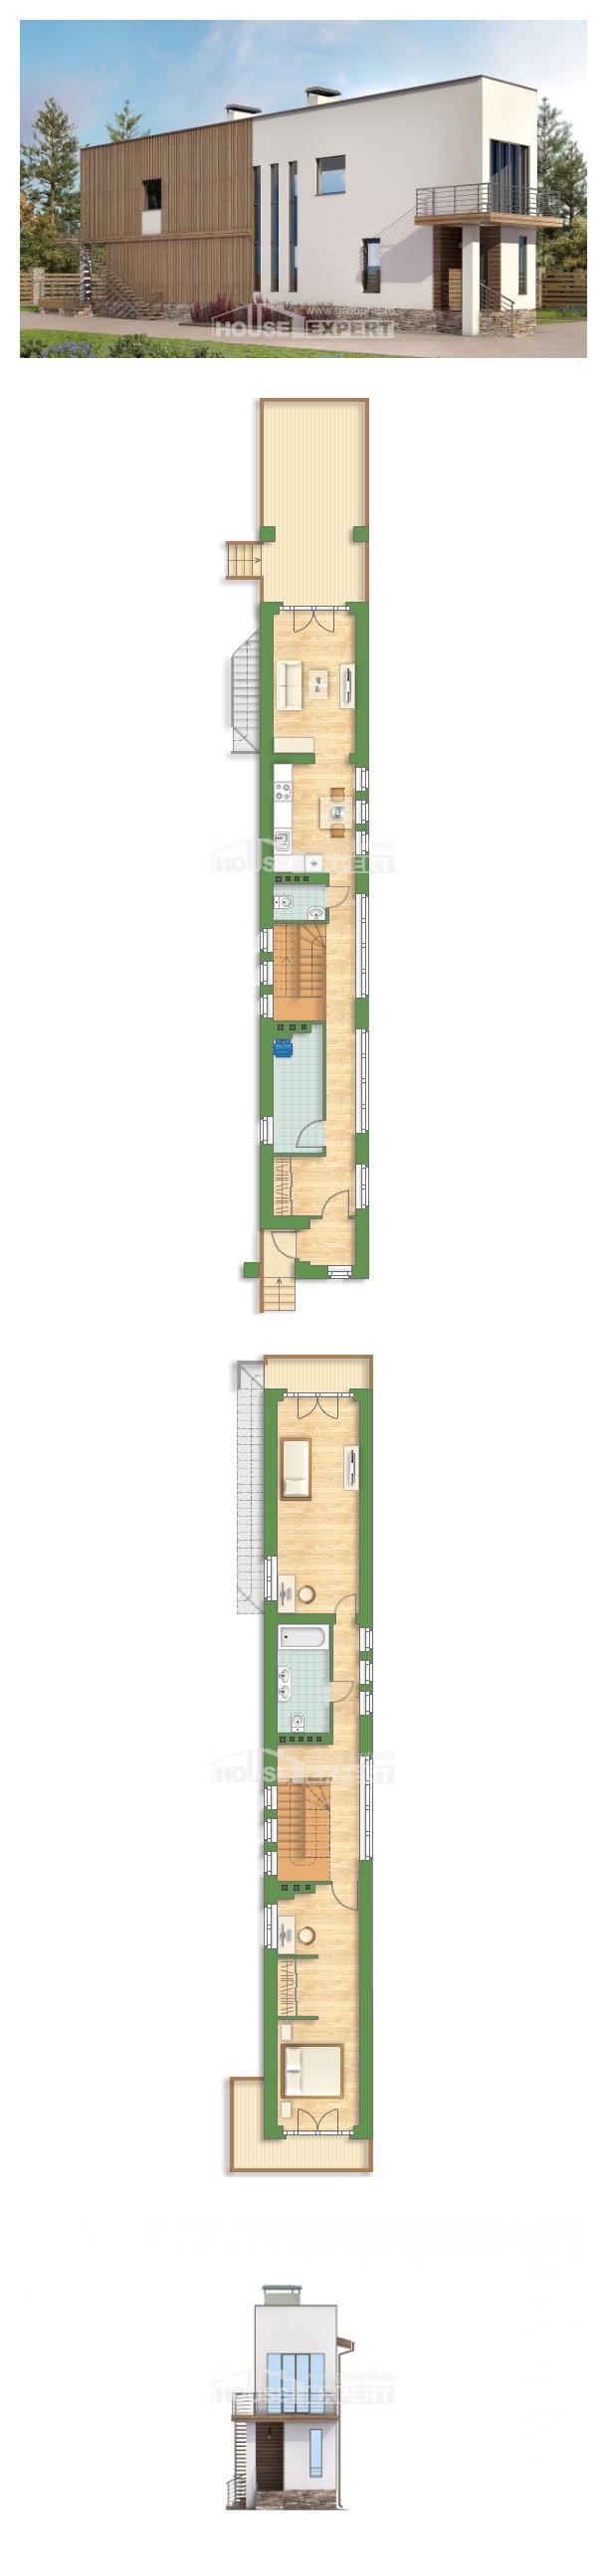 Проект дома 100-003-Л | House Expert